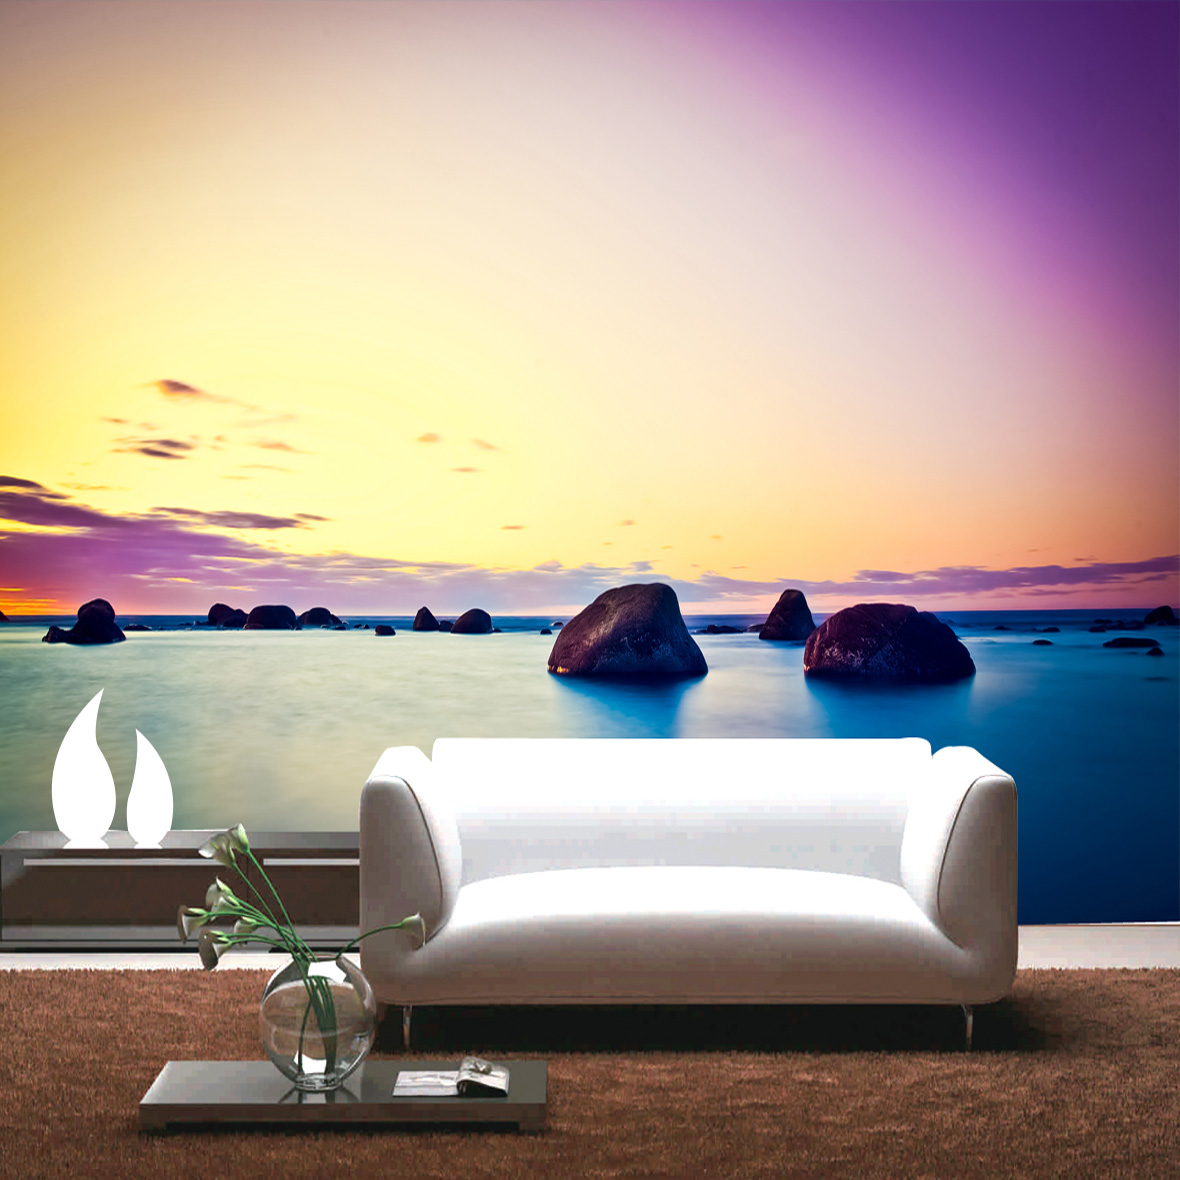 living mural sunset bedroom korean wall backdrop landscape ocean 3d tv wallpapers